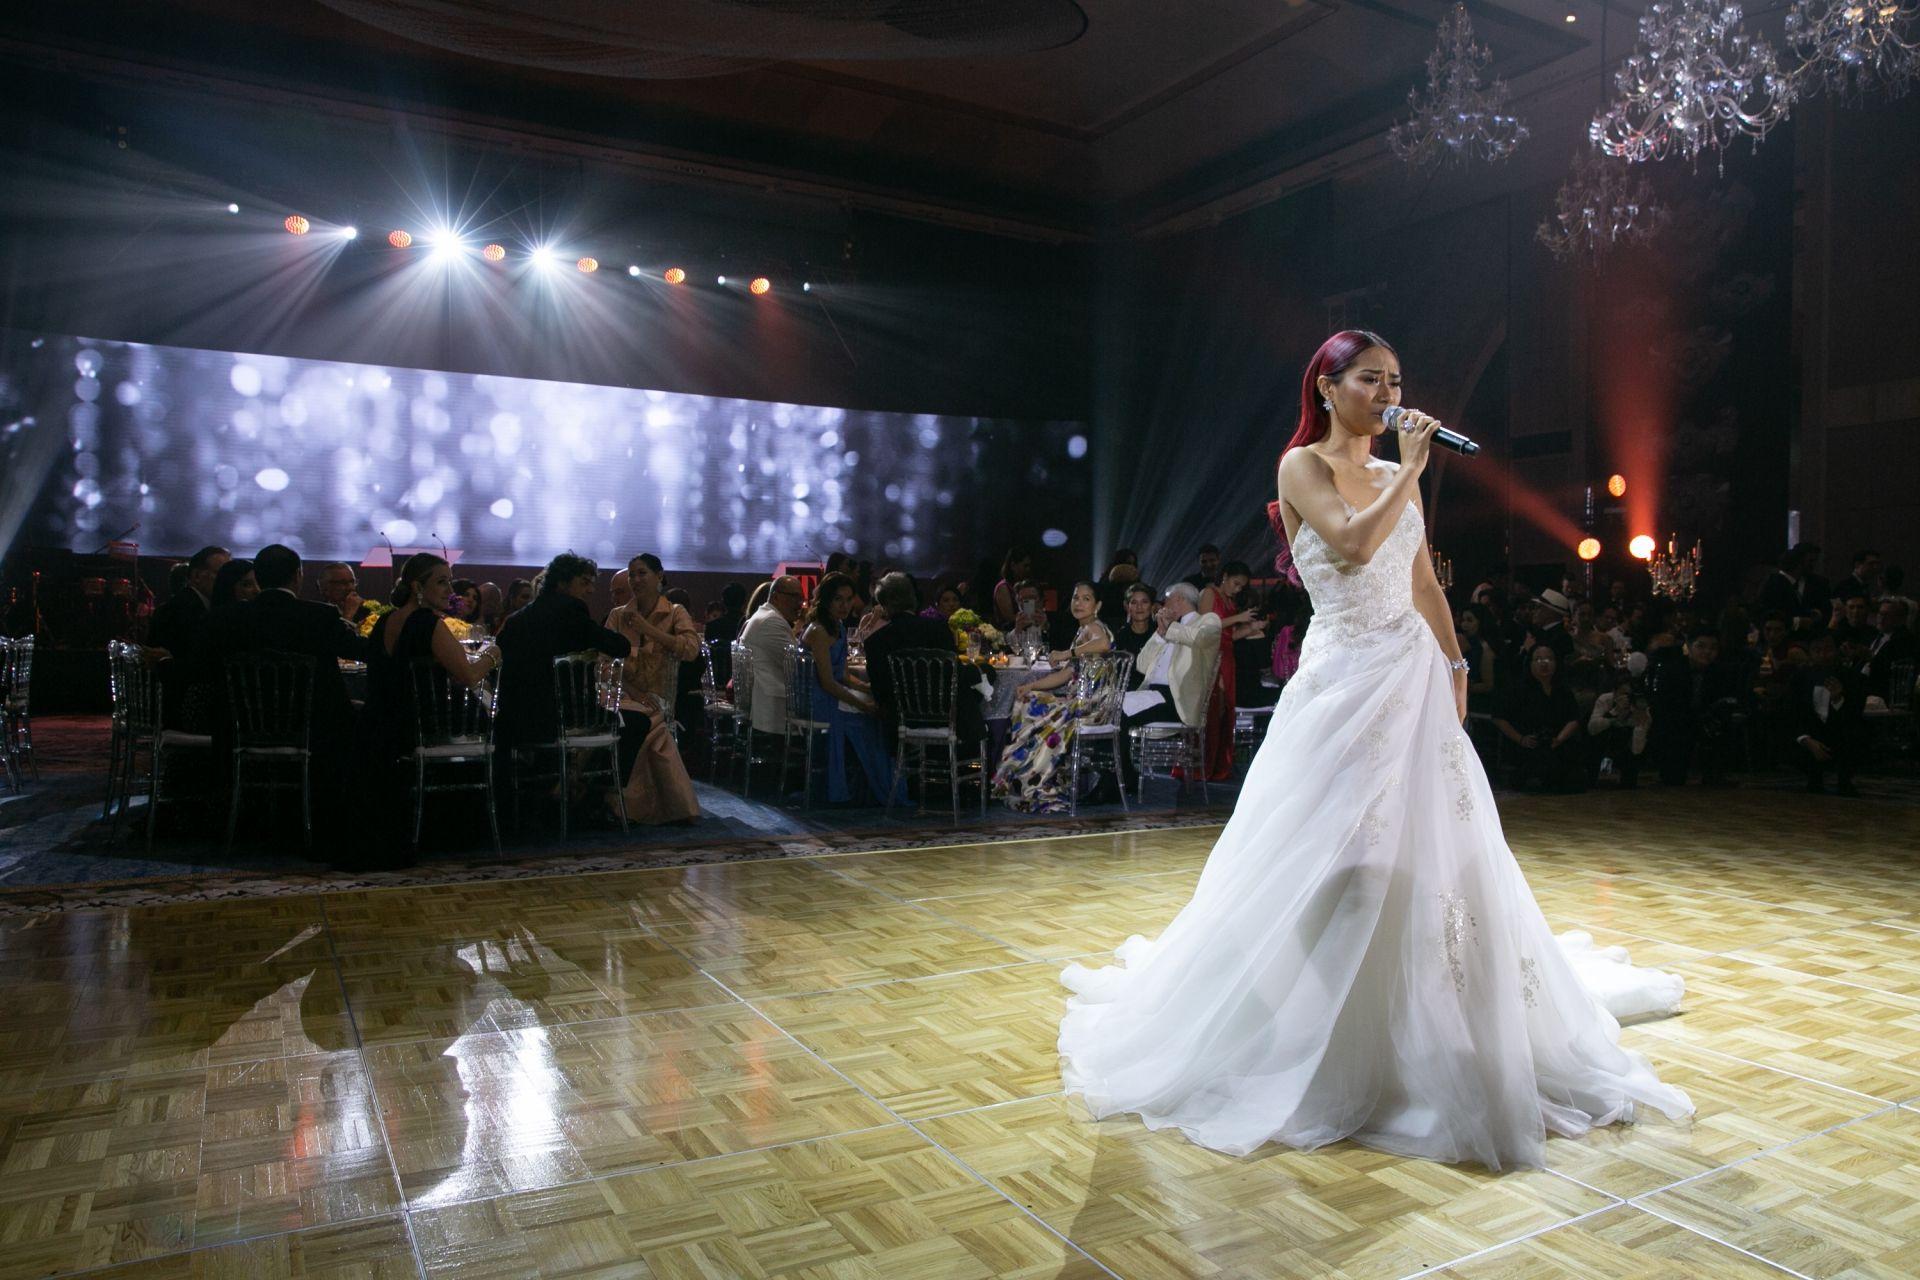 American Idol alumni Jessica Sanchez wows the crowd